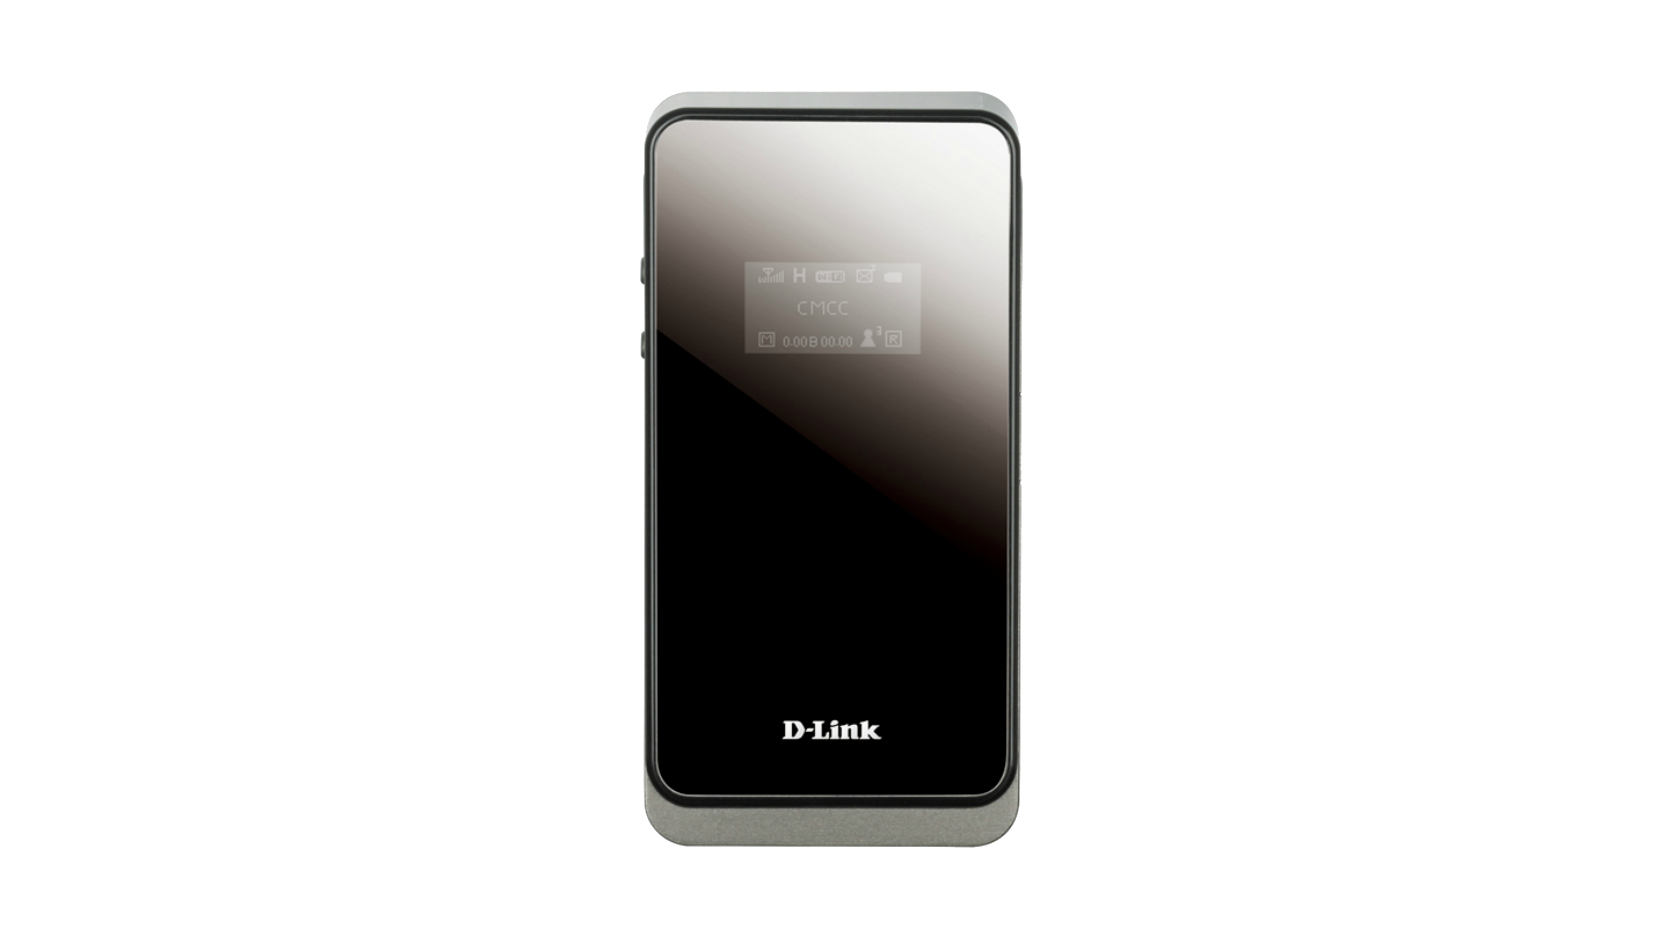 WIFI D-LINK 3G ROUTER N150 PORTATIL